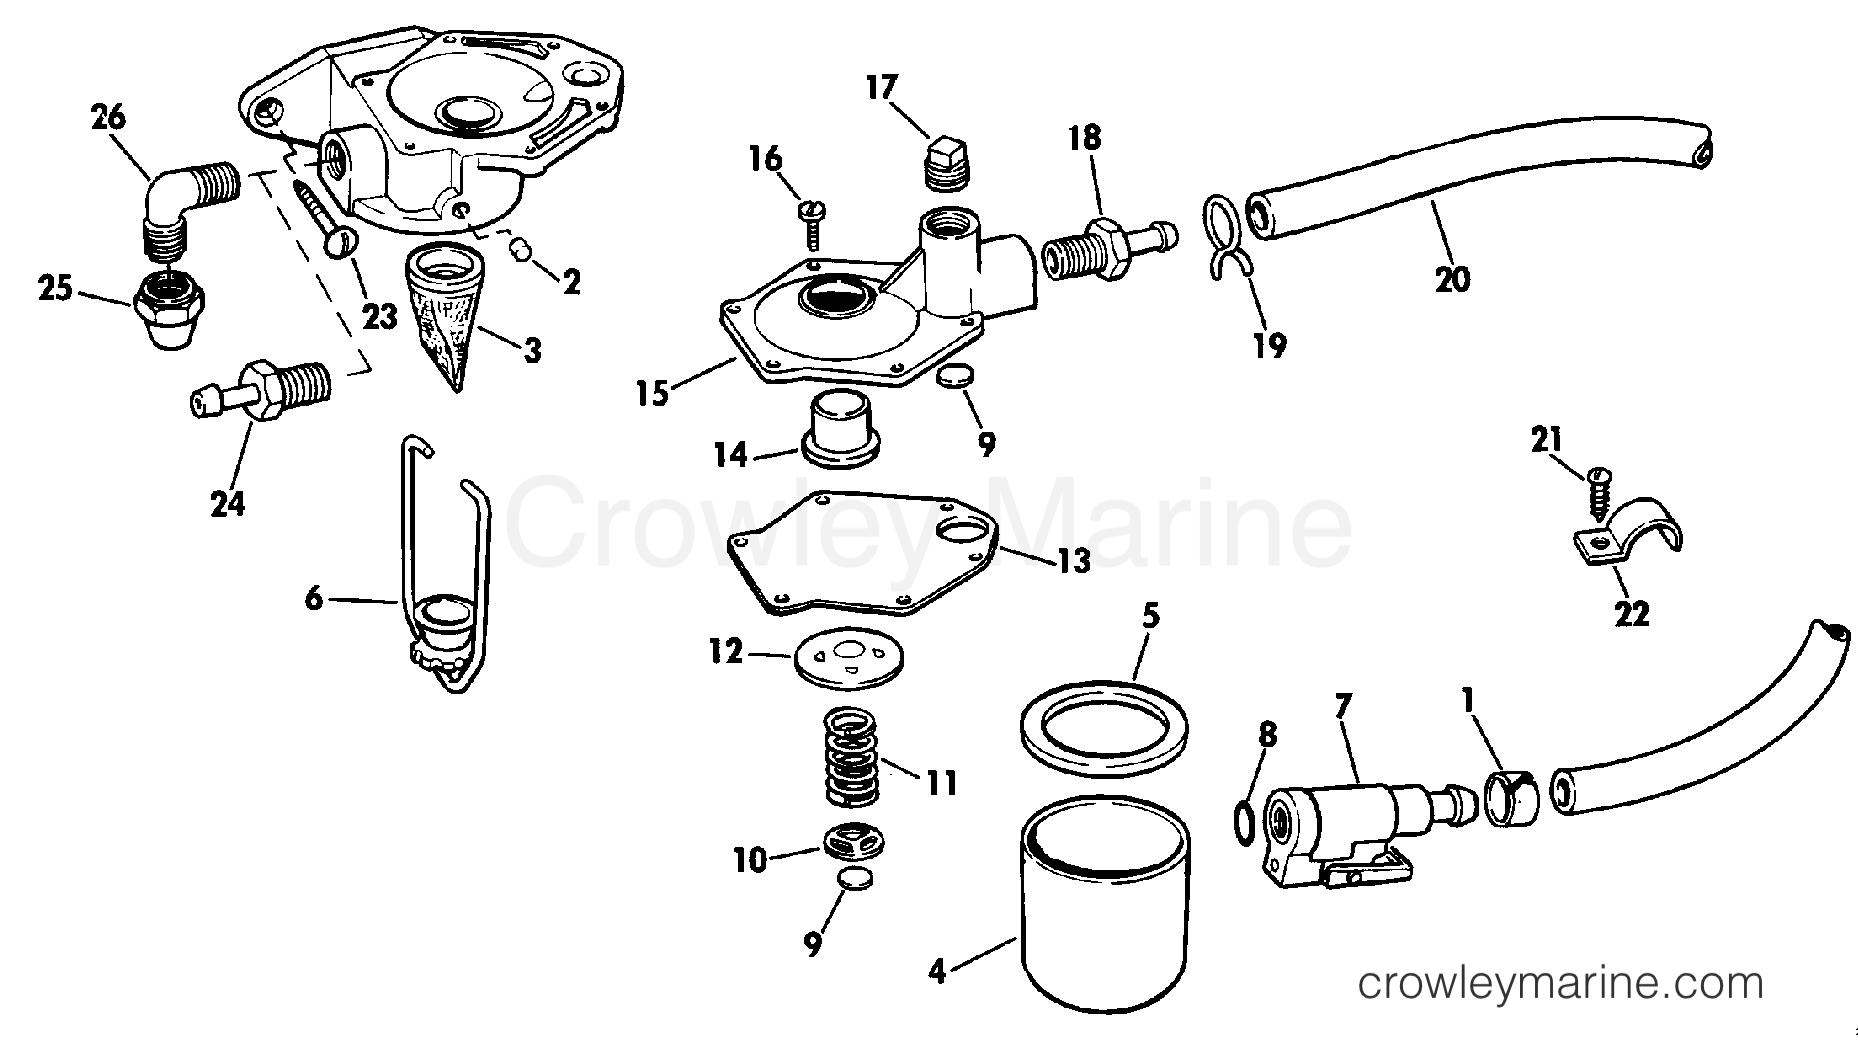 1985 Rigging Parts Accessories - Fuel System - PRIMER PUMP KIT